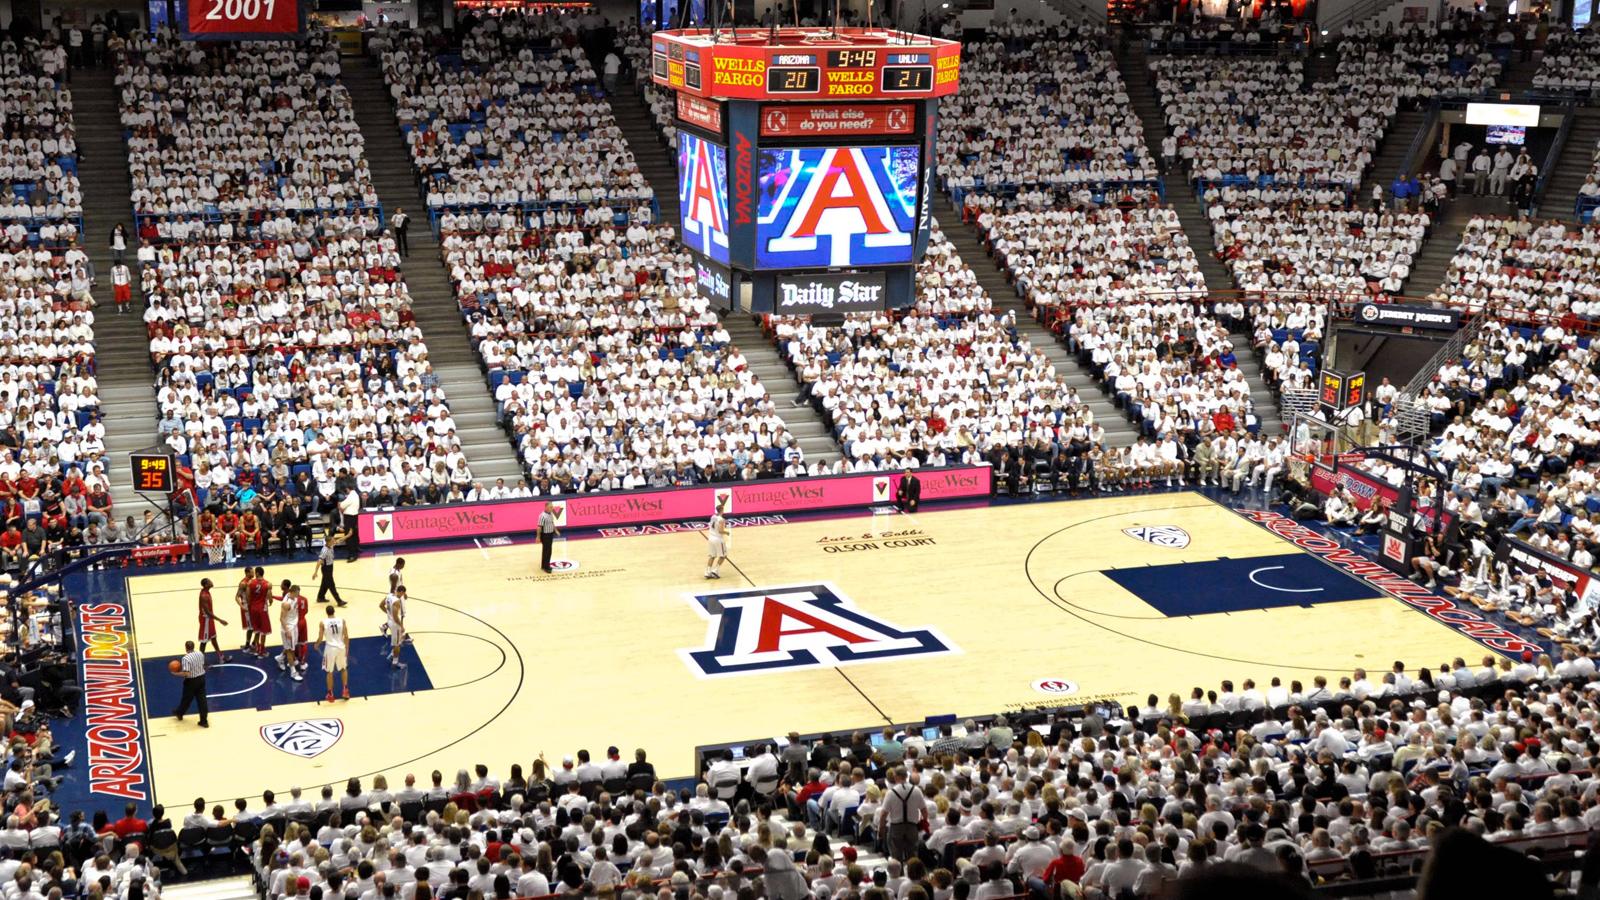 UConn Adds Arizona and Ohio State - The UConn Blog